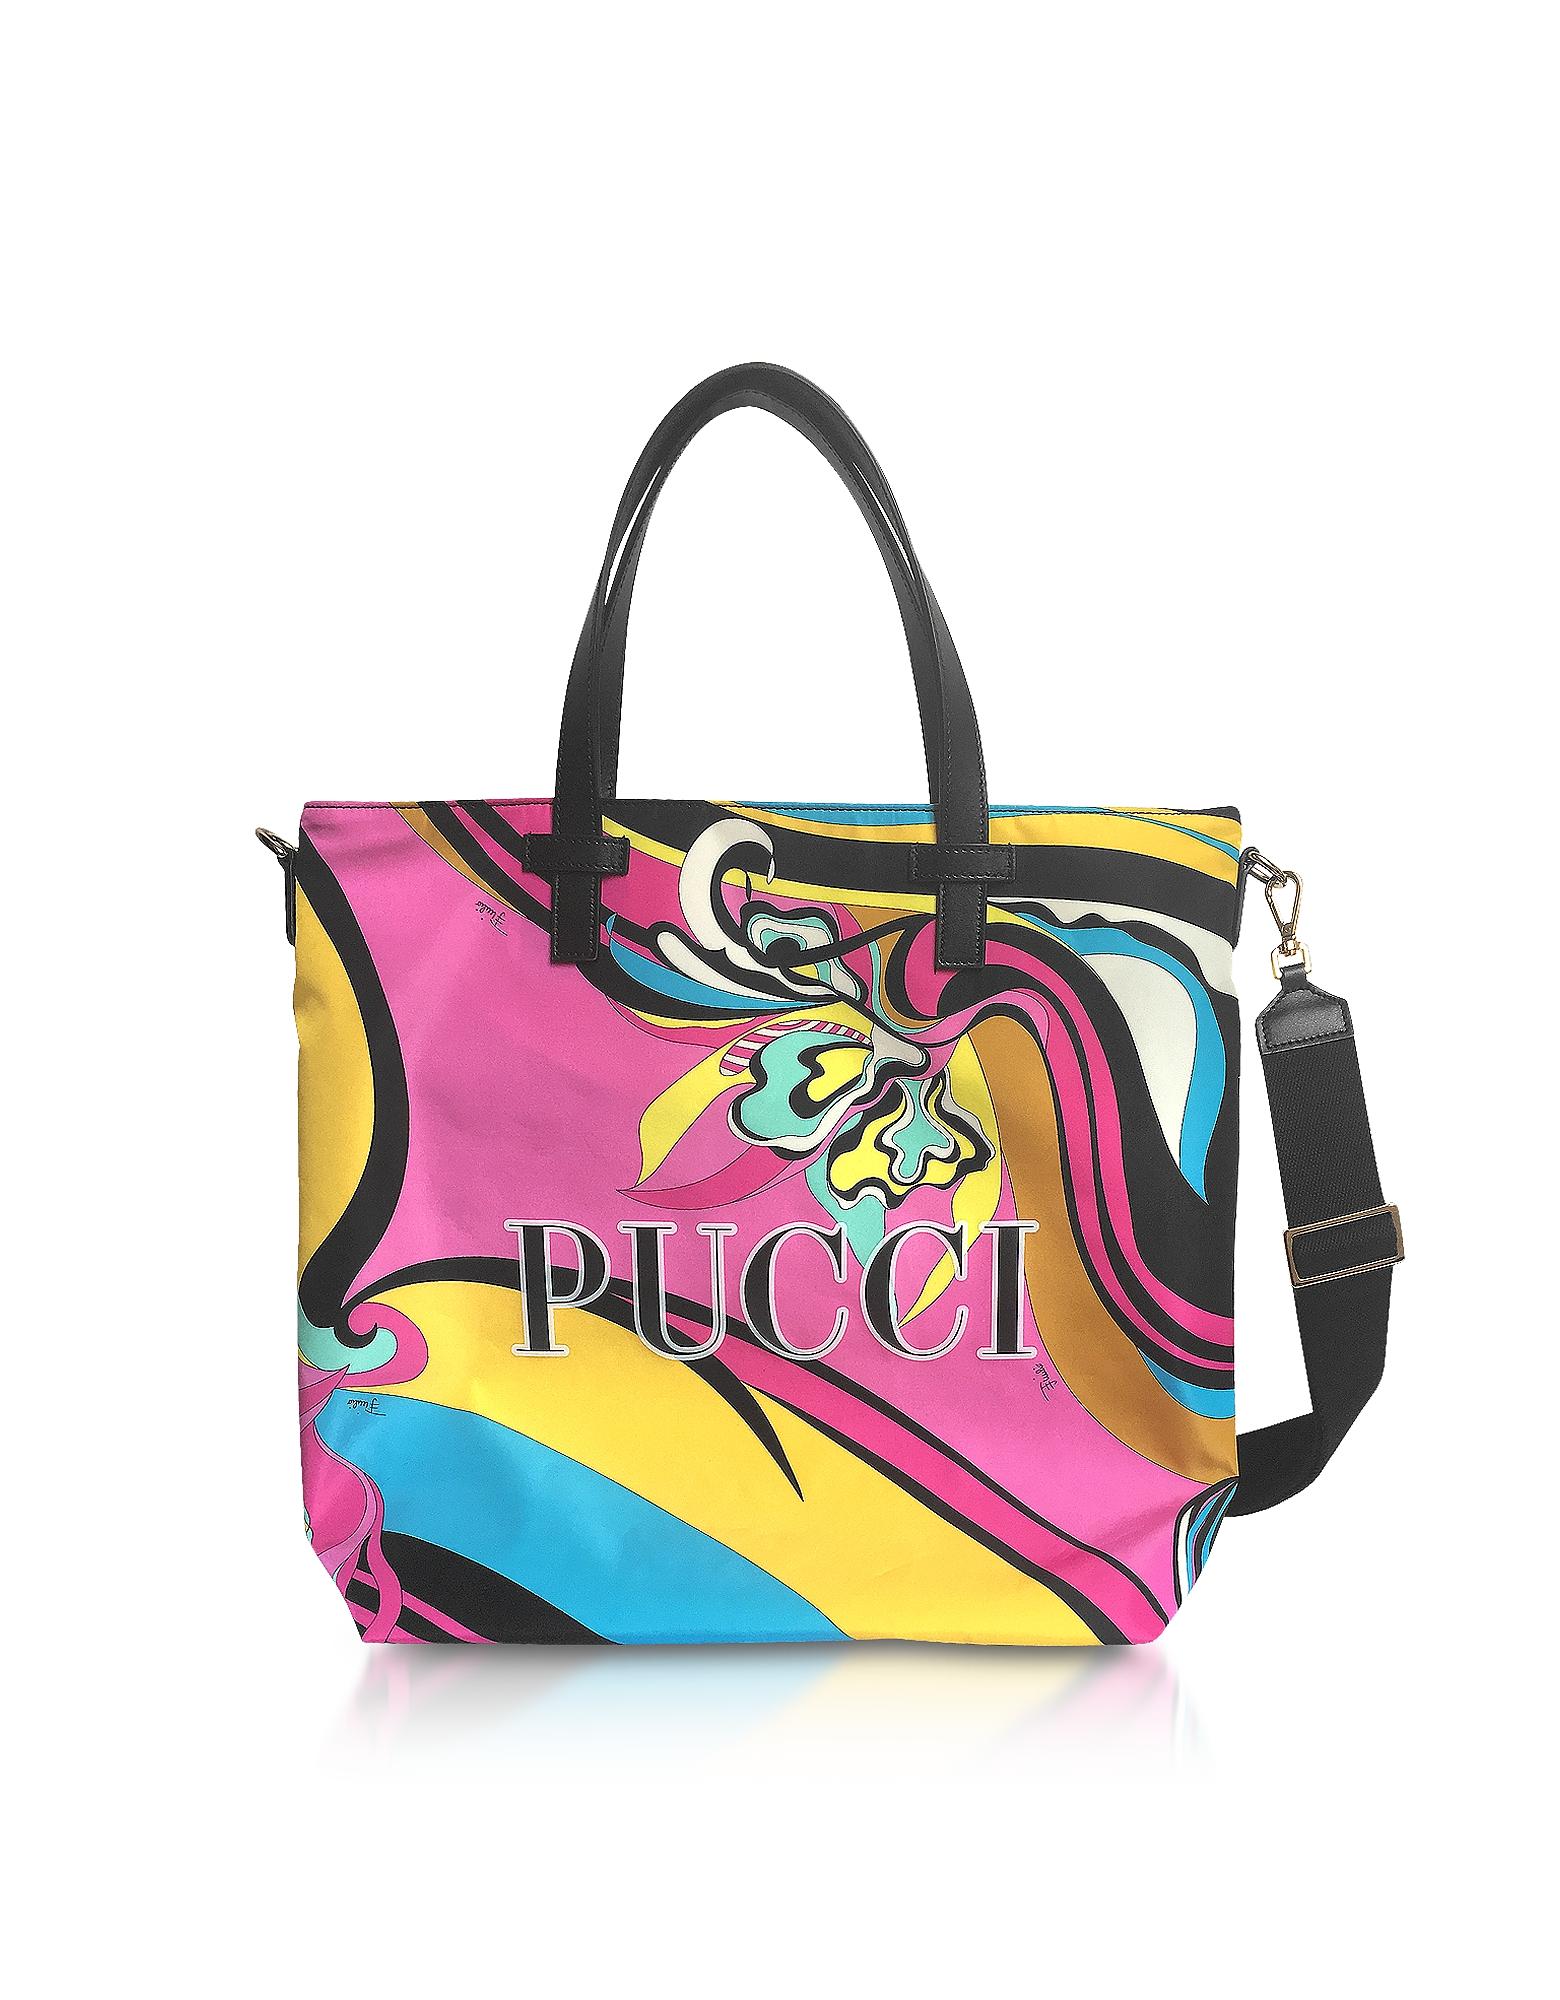 Emilio Pucci Handbags, Signature Printed Canvas Tote Bag